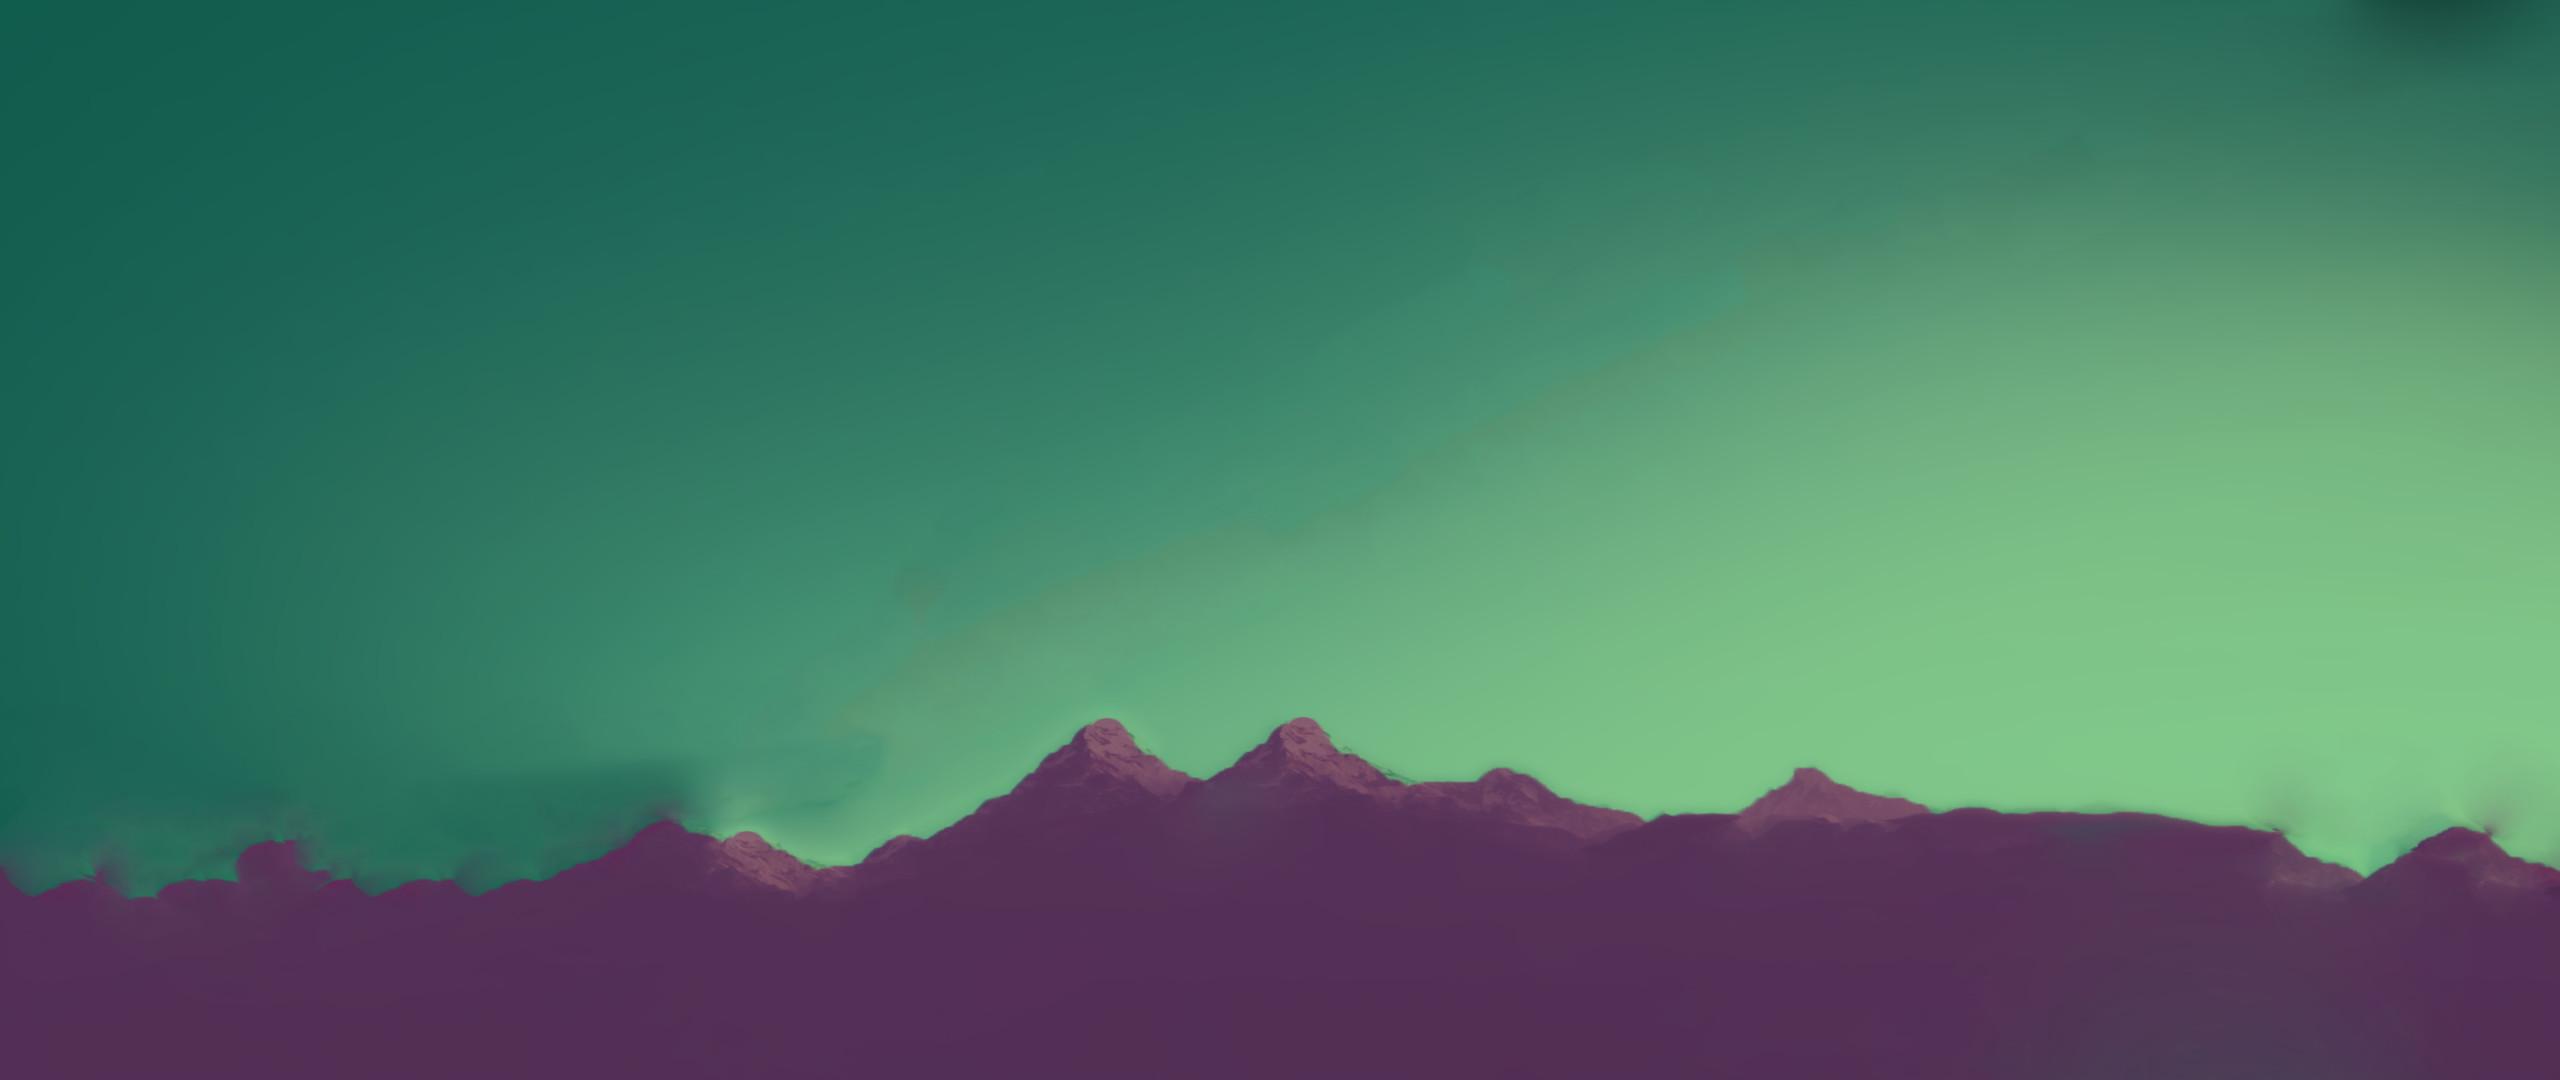 Earth – Mountain Cyan Pink Wallpaper